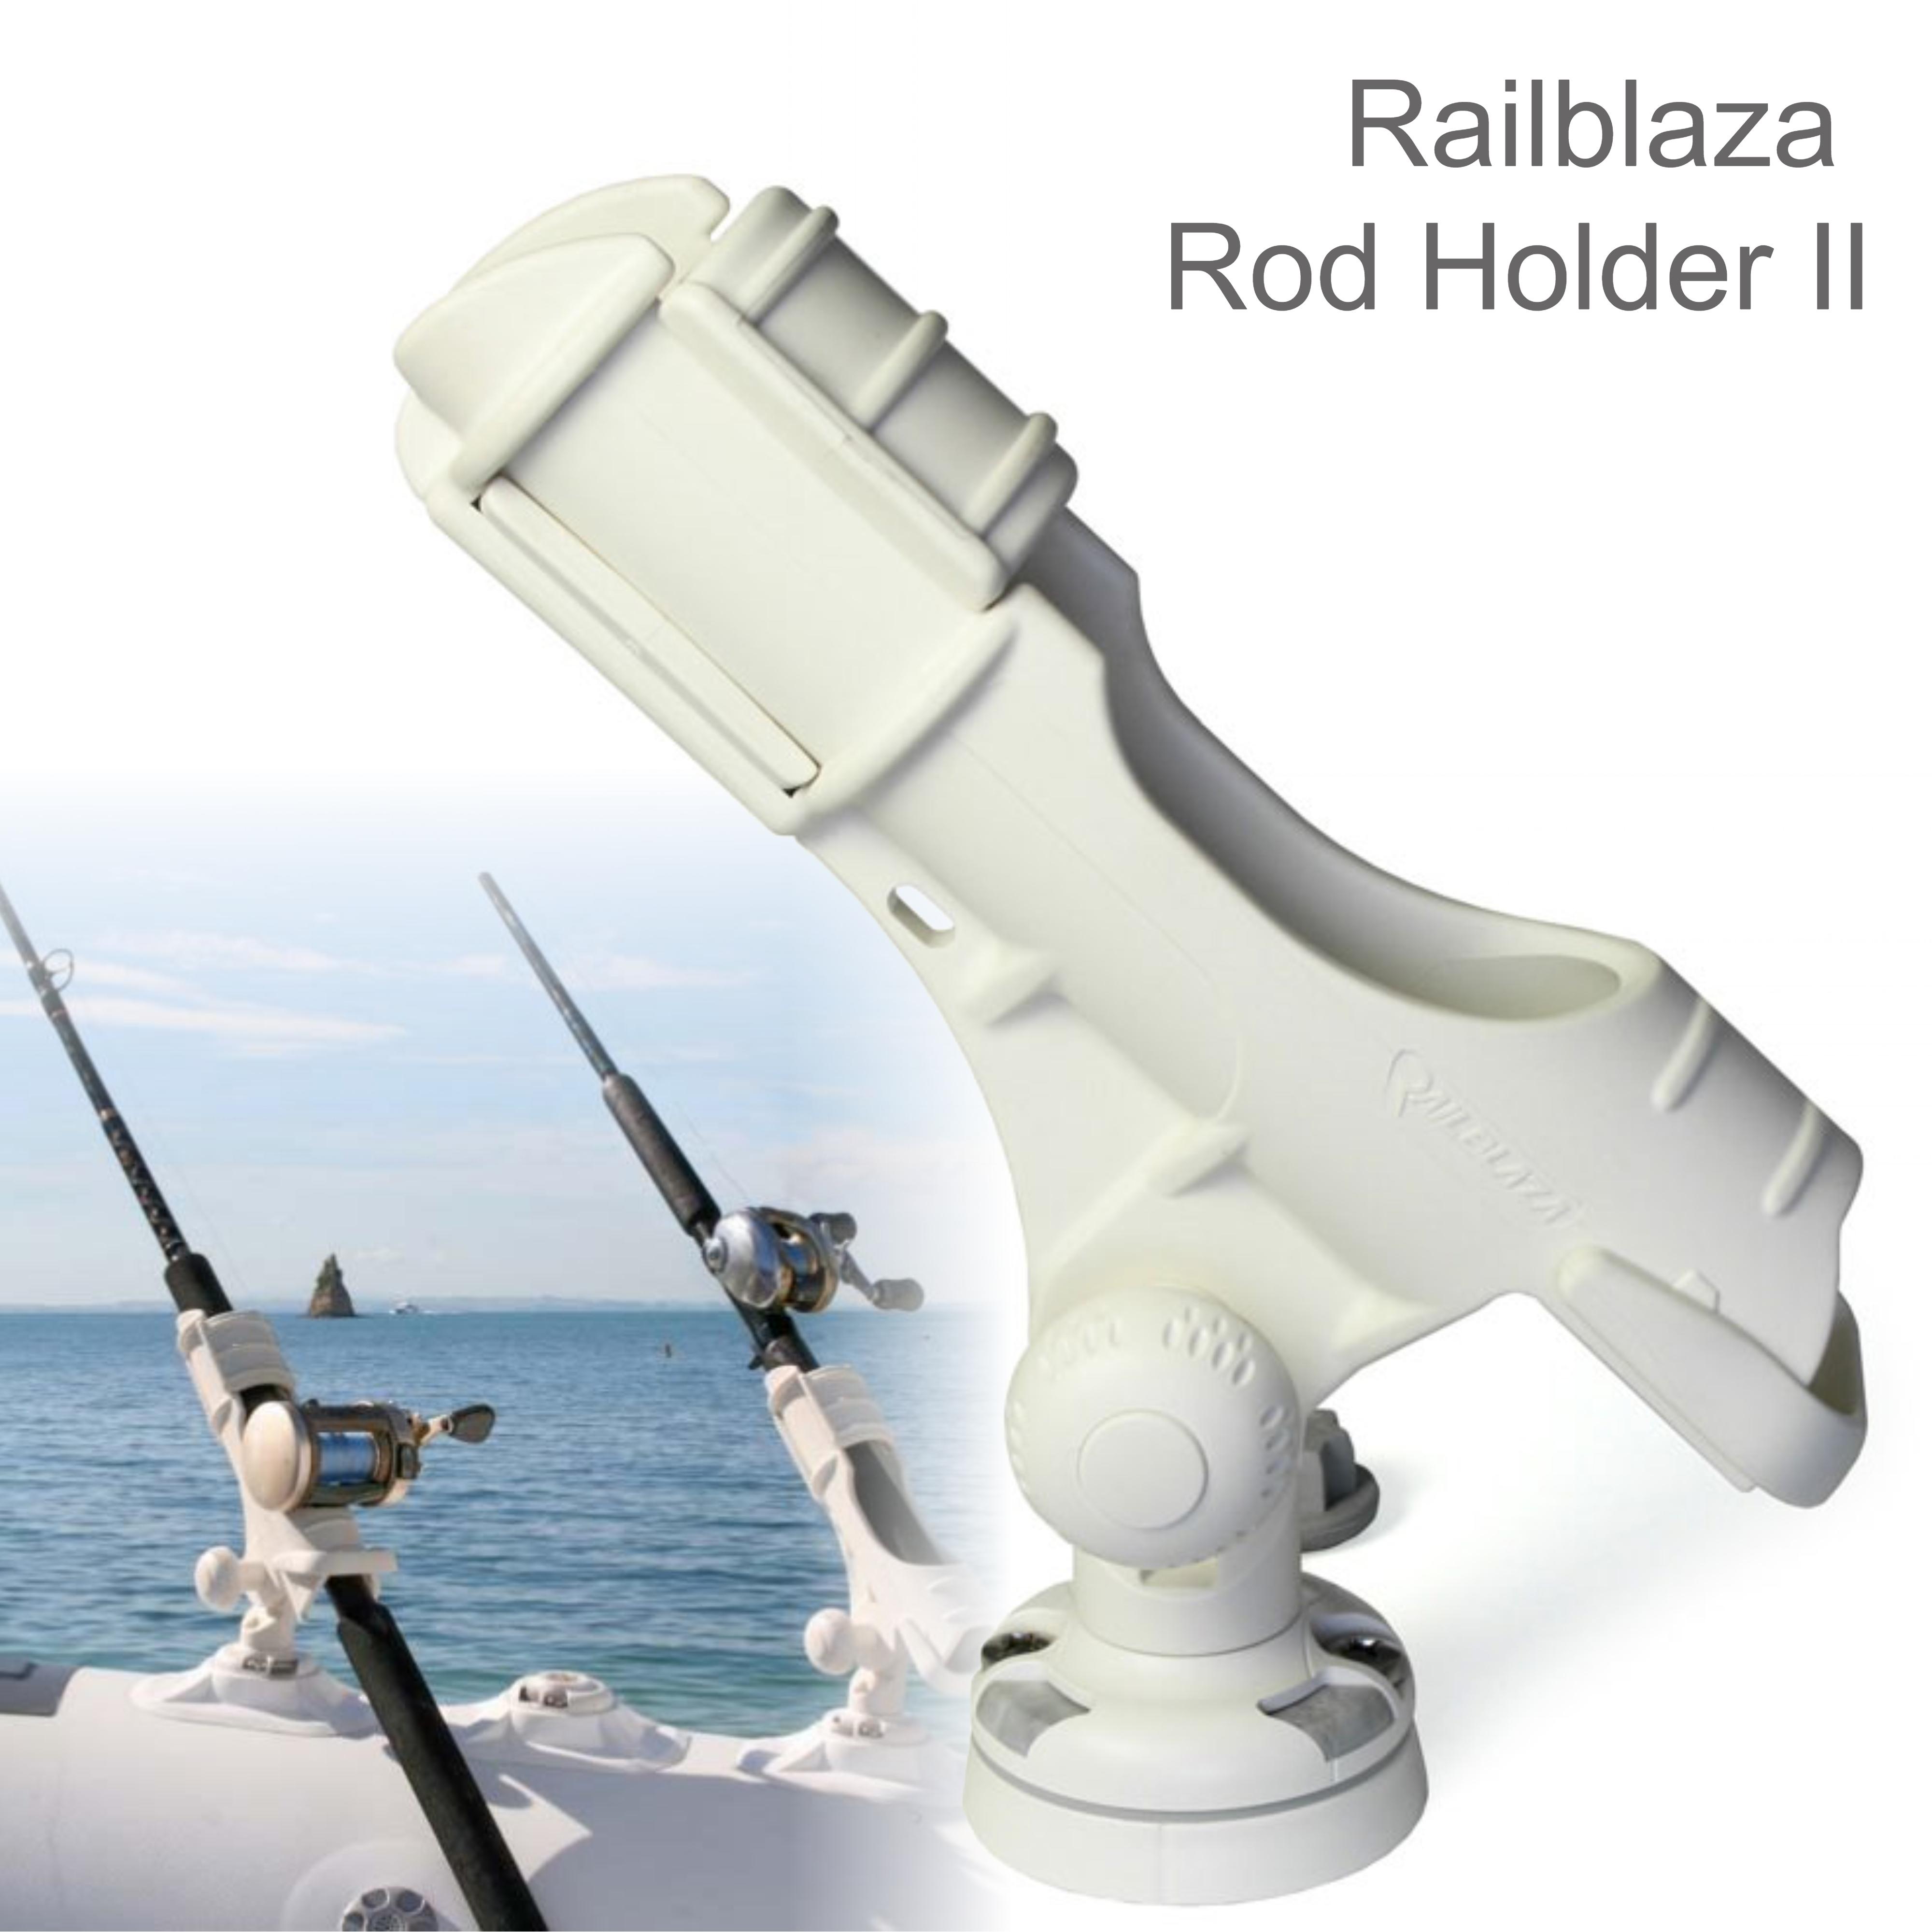 Railblaza Rod Holder II StarPort Kit?Kayak & Fishing Accessory?04-4020-21?White